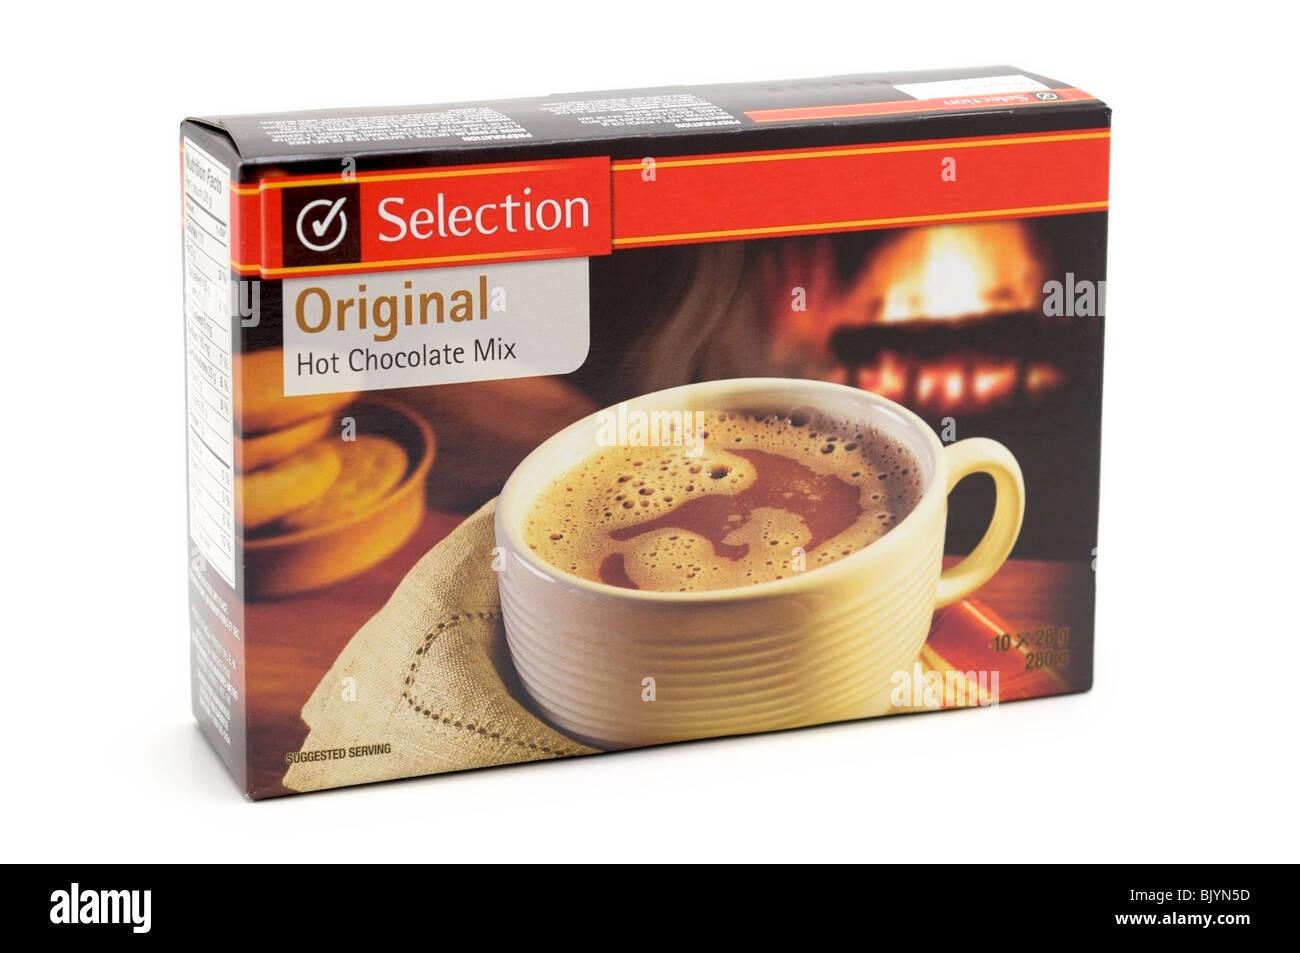 Hot Chocolate Mix - Stock Image